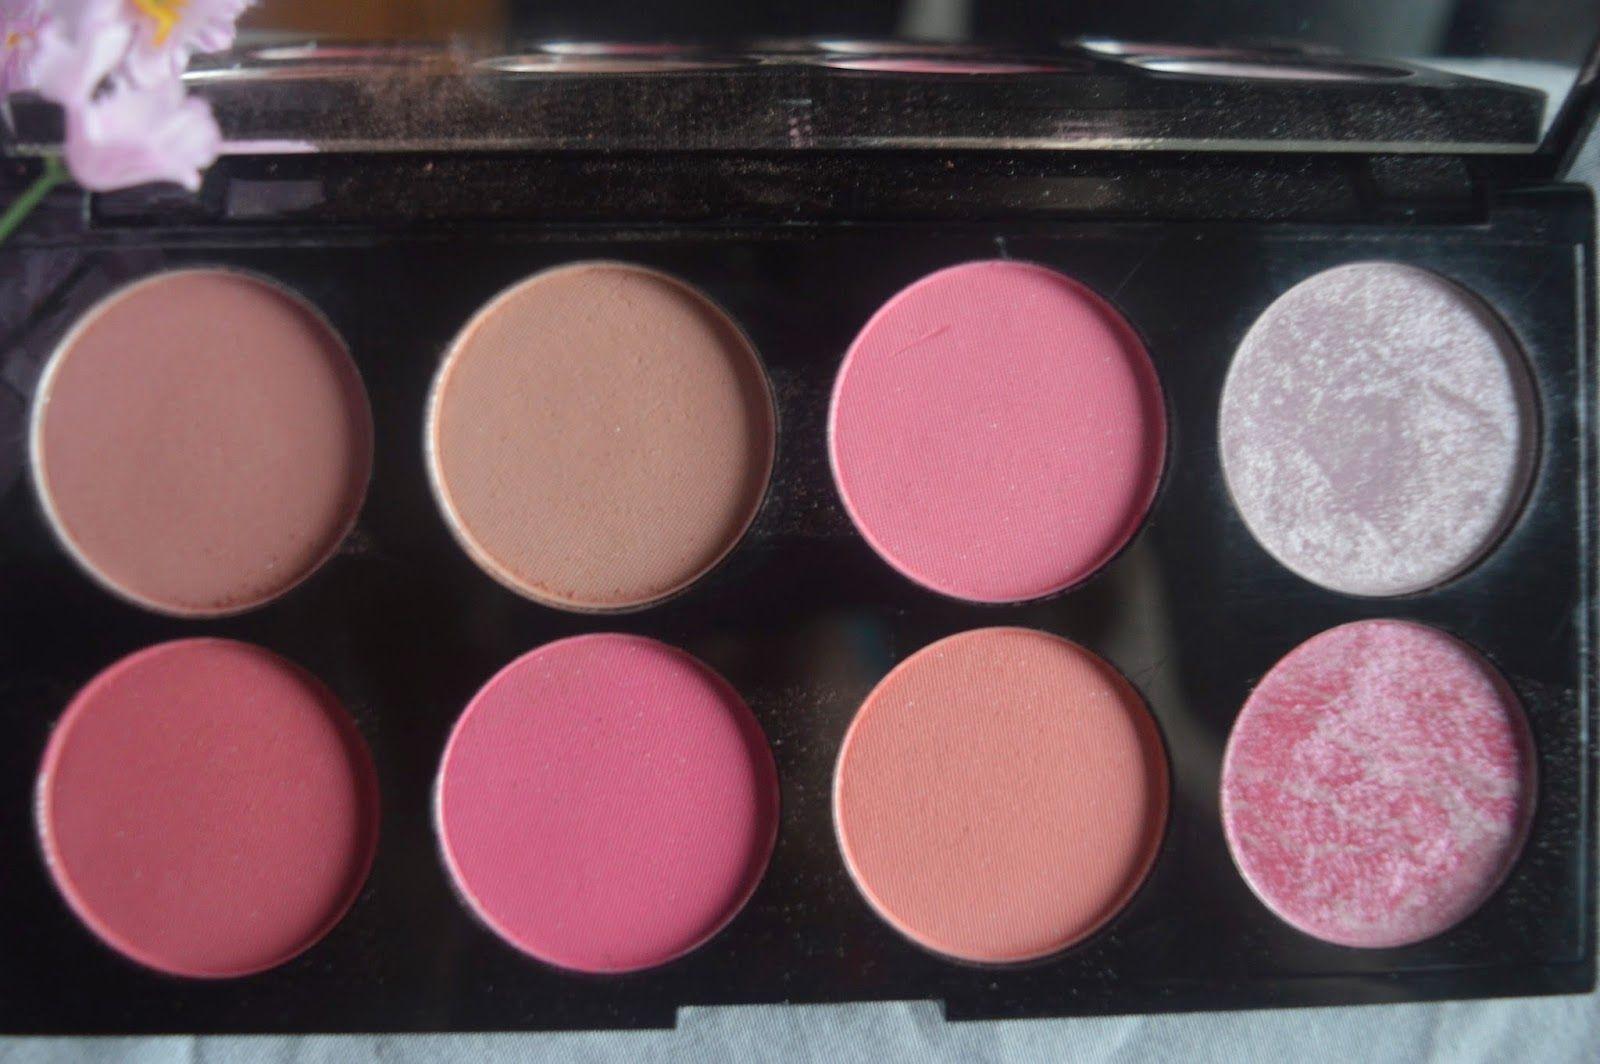 Makeup Revolution - Sugar and Spice Palette - Brand new still sealed